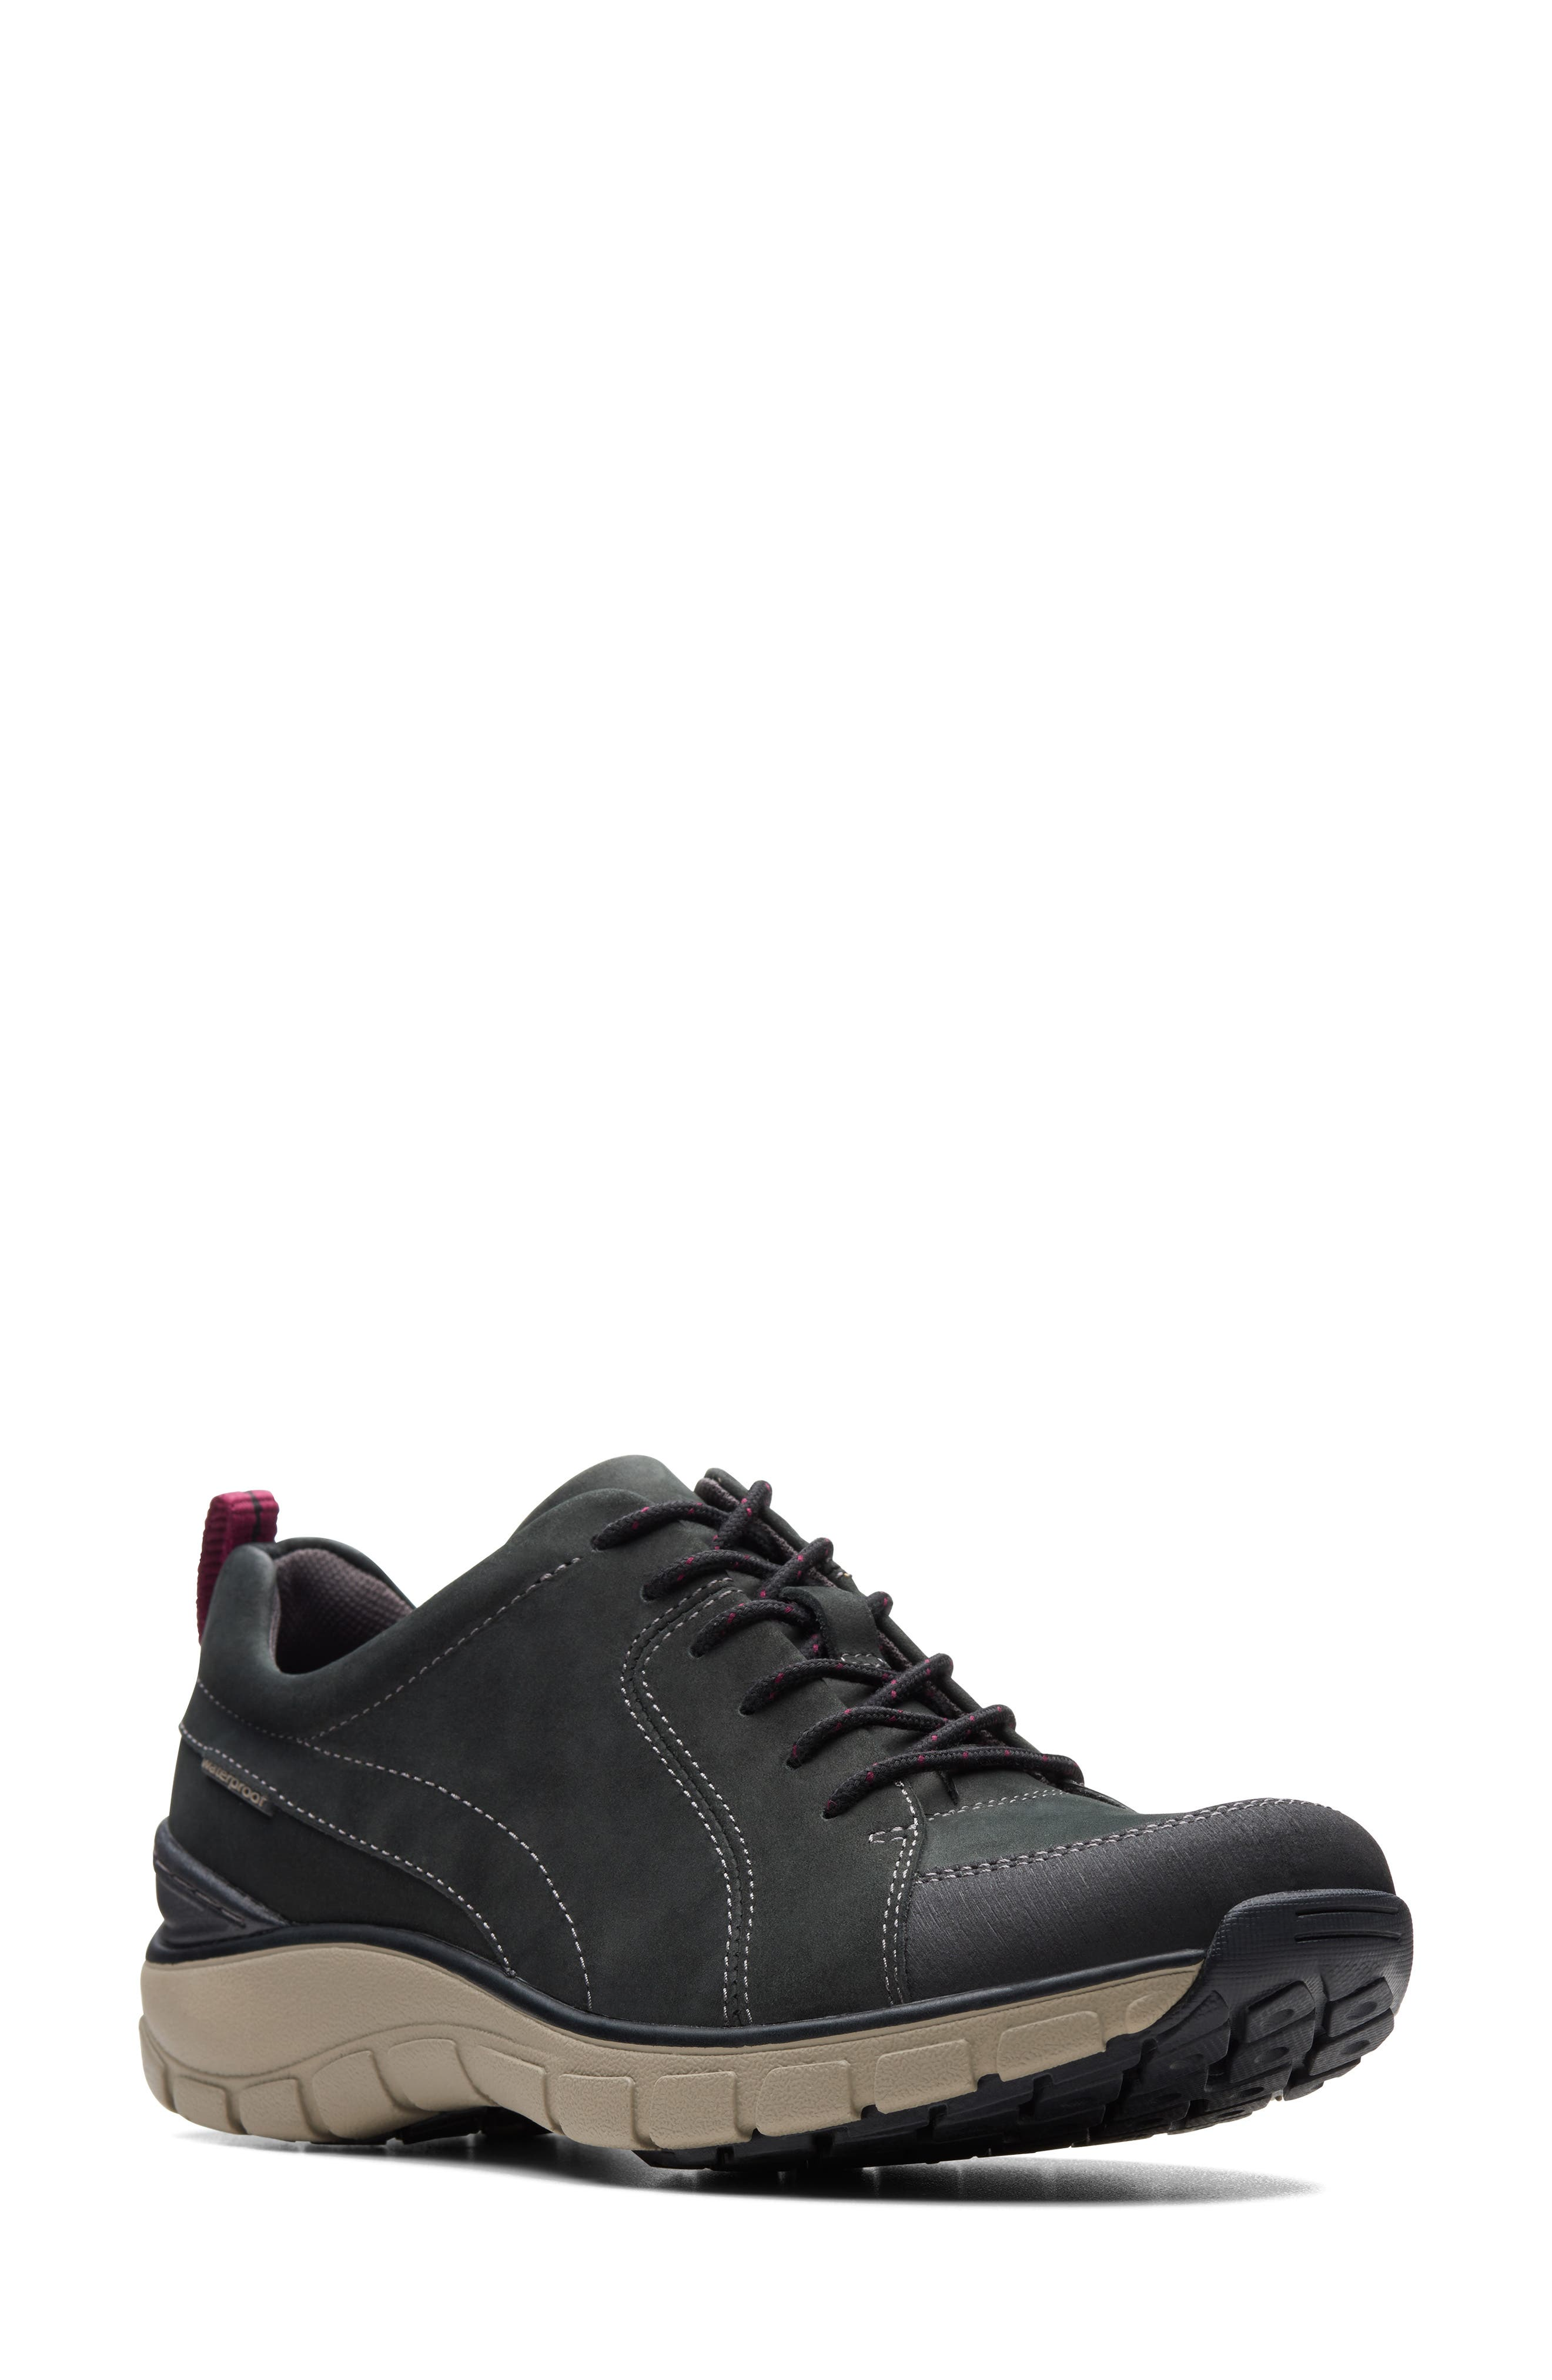 Wave Go Waterproof Sneaker, Main, color, BLACK NUBUCK/ LEATHER COMBI